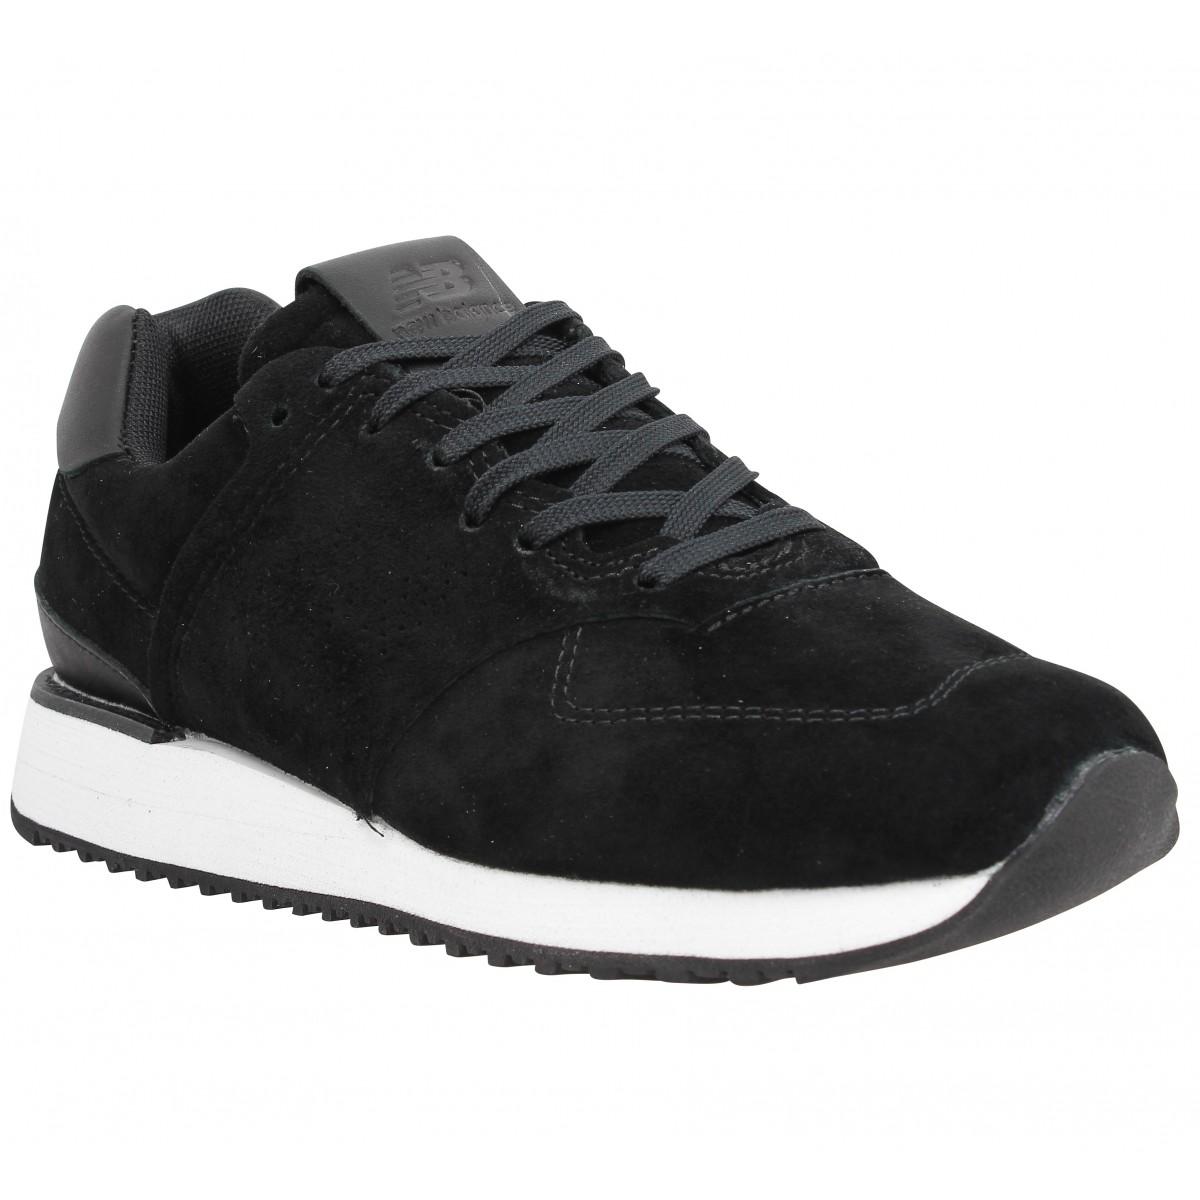 new balance wl745 velours femme noir femme fanny chaussures. Black Bedroom Furniture Sets. Home Design Ideas